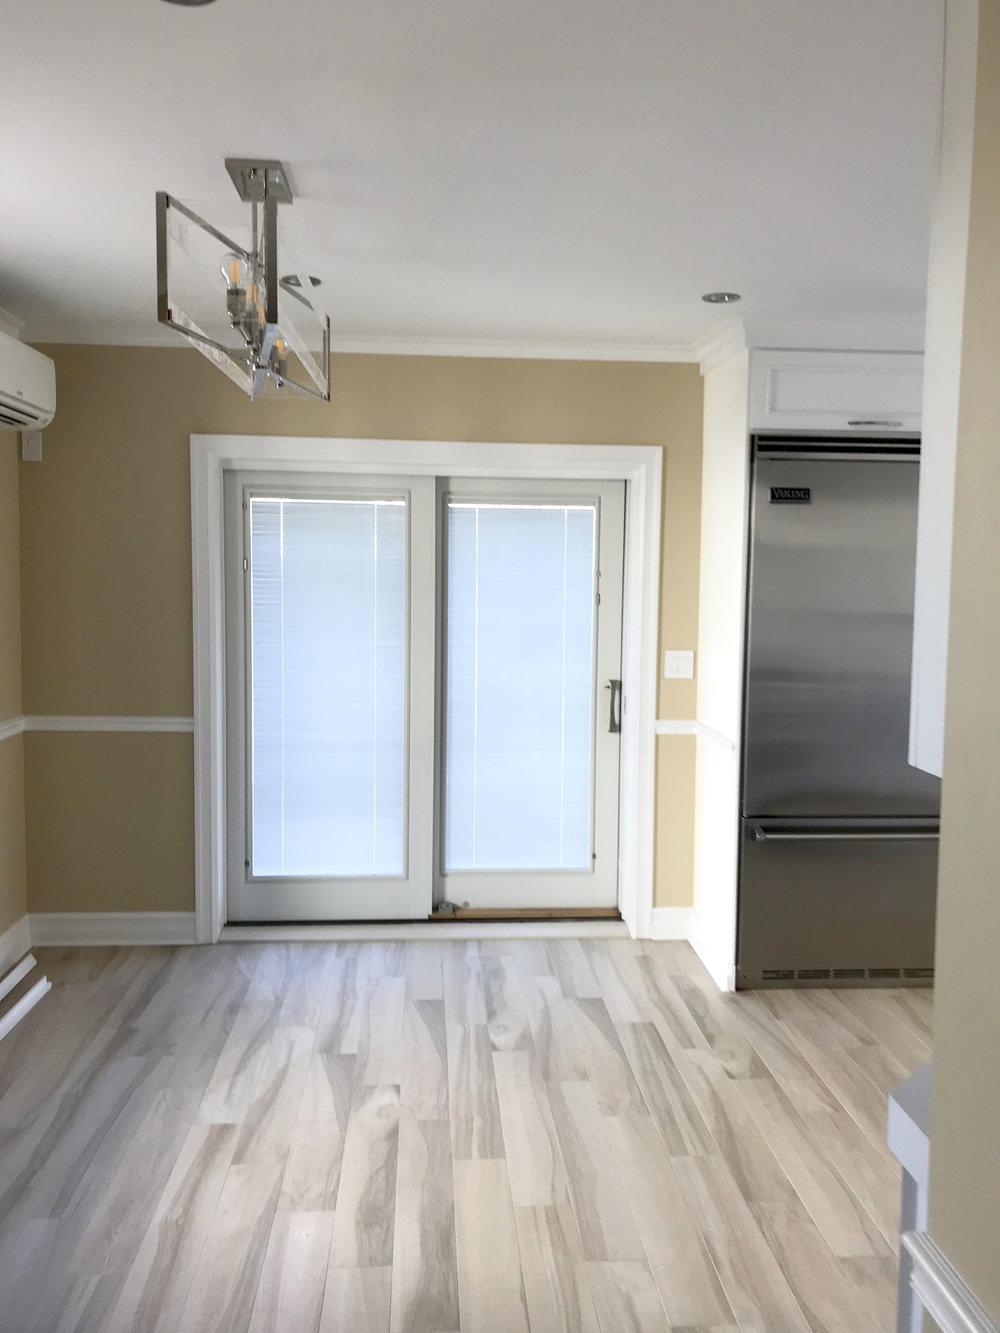 woodgrain-kitchen1.jpg